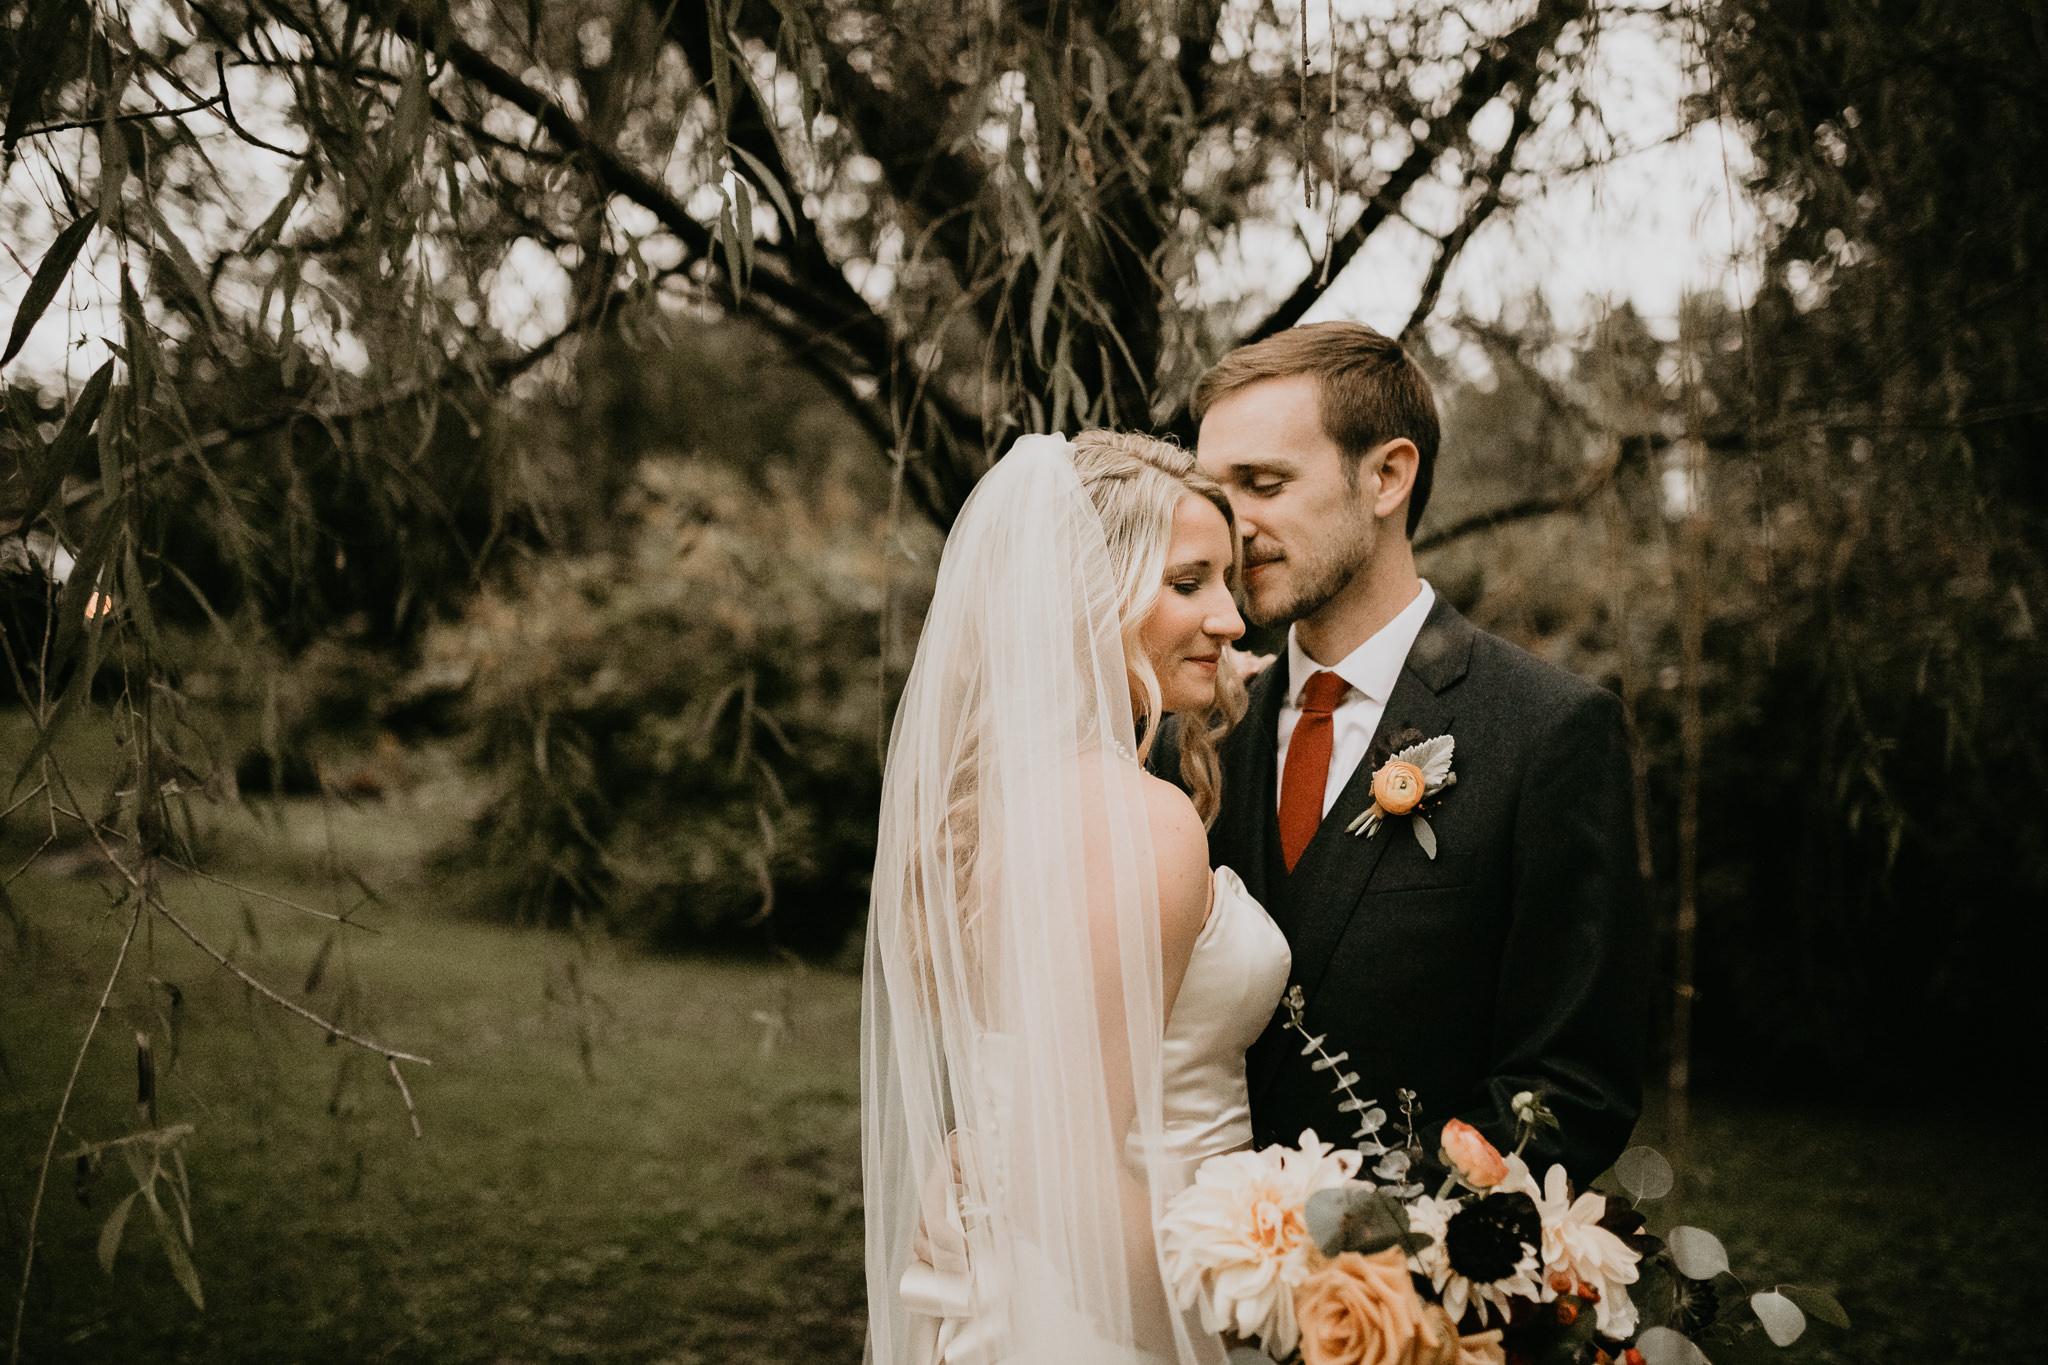 Sundara - Weddings - Virginia - Best Wedding Photographer - Pat Cori Photography-74.jpg